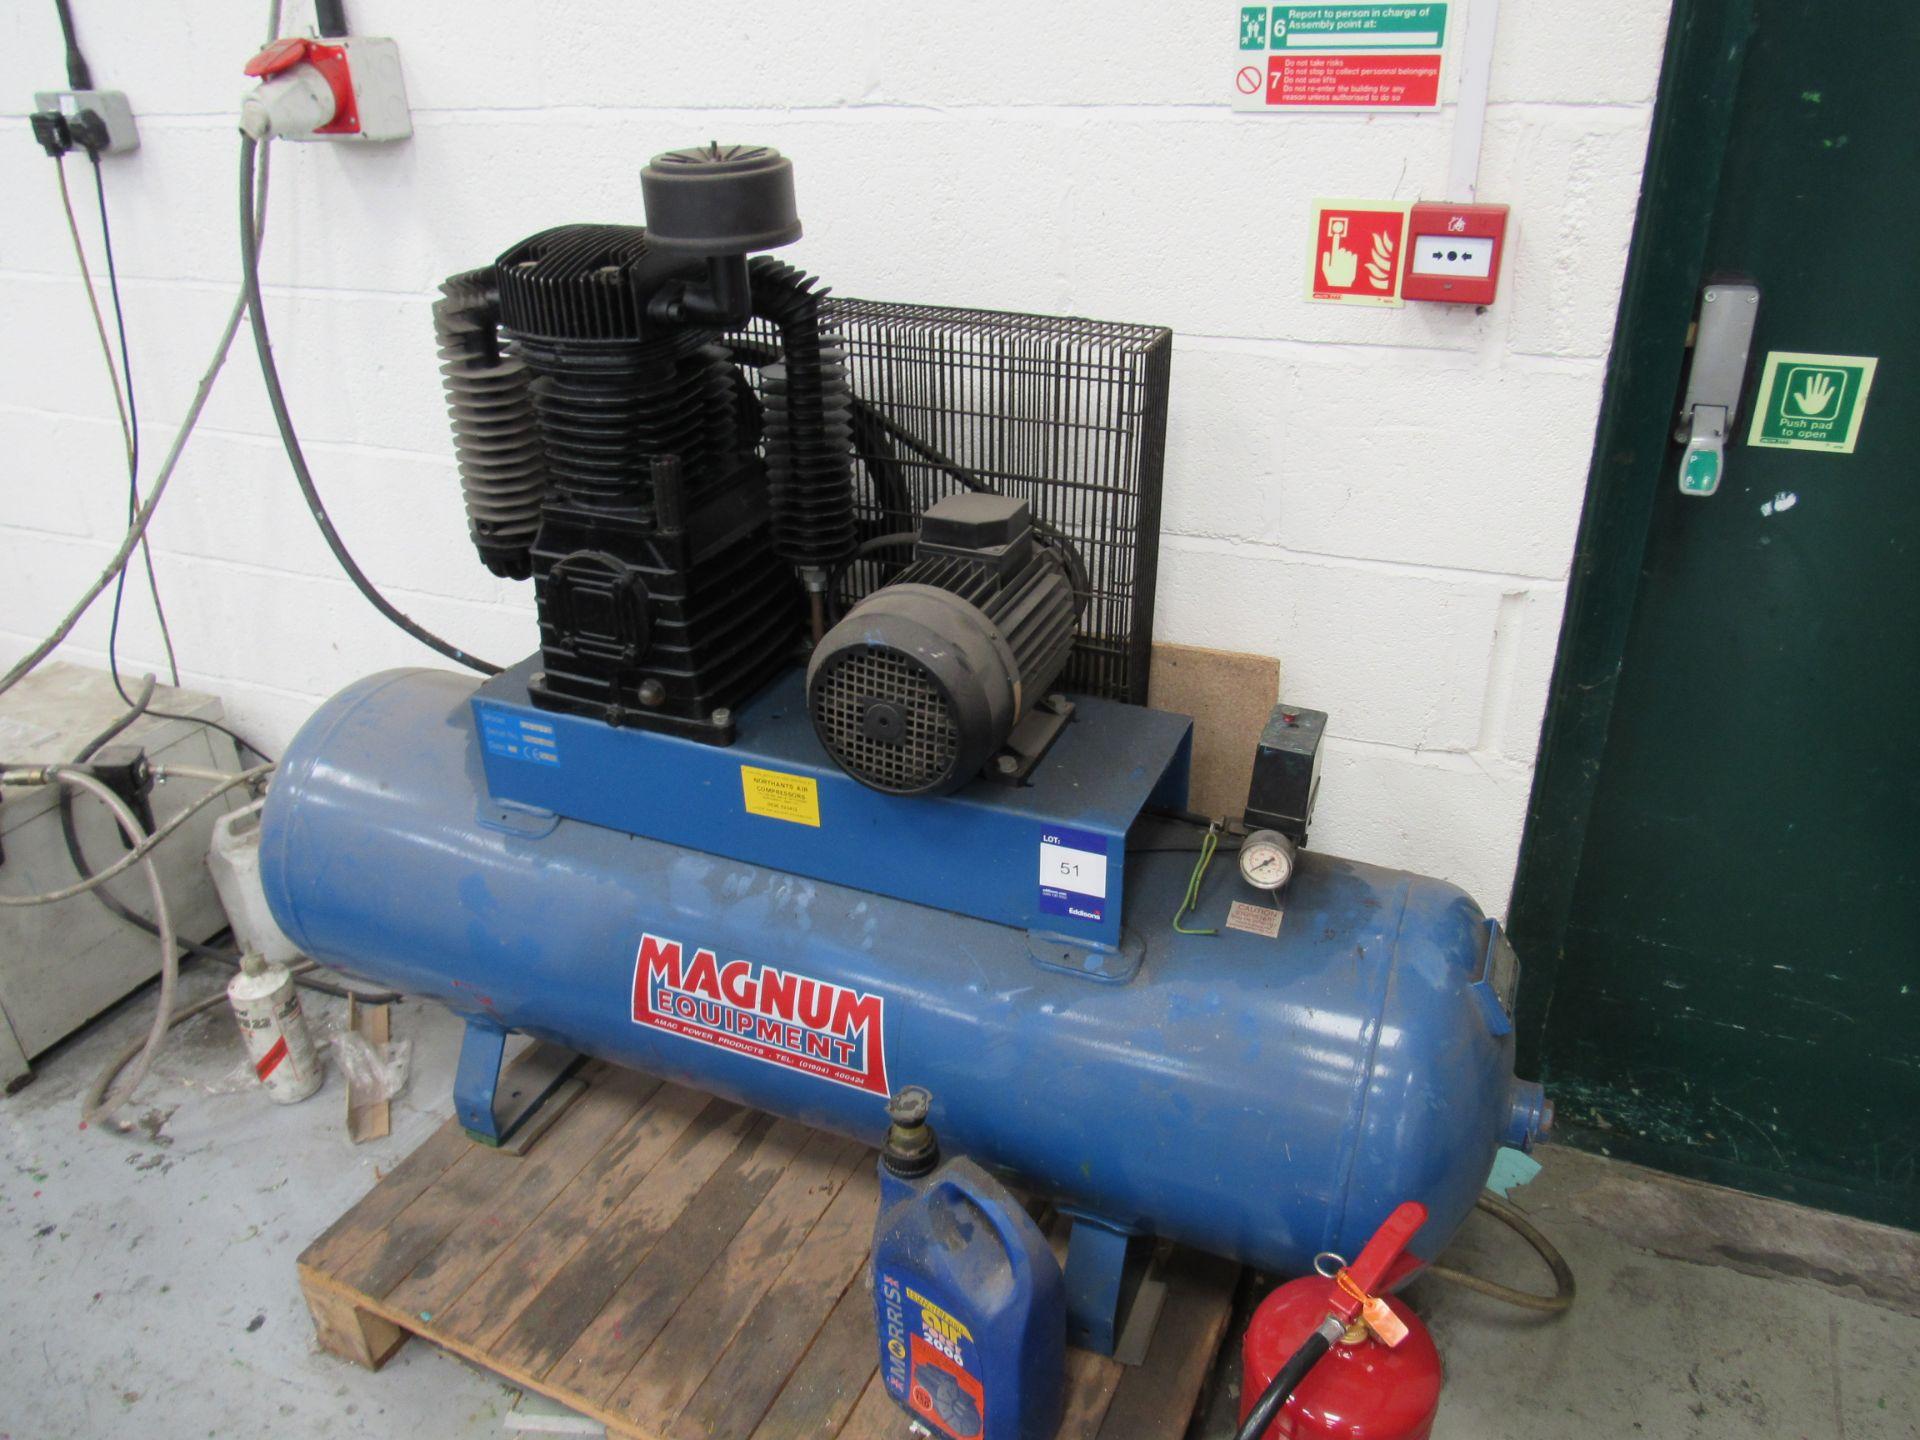 Magnum SX27/240 Receiver Mounted Compressor Serial Number 8745, 1995